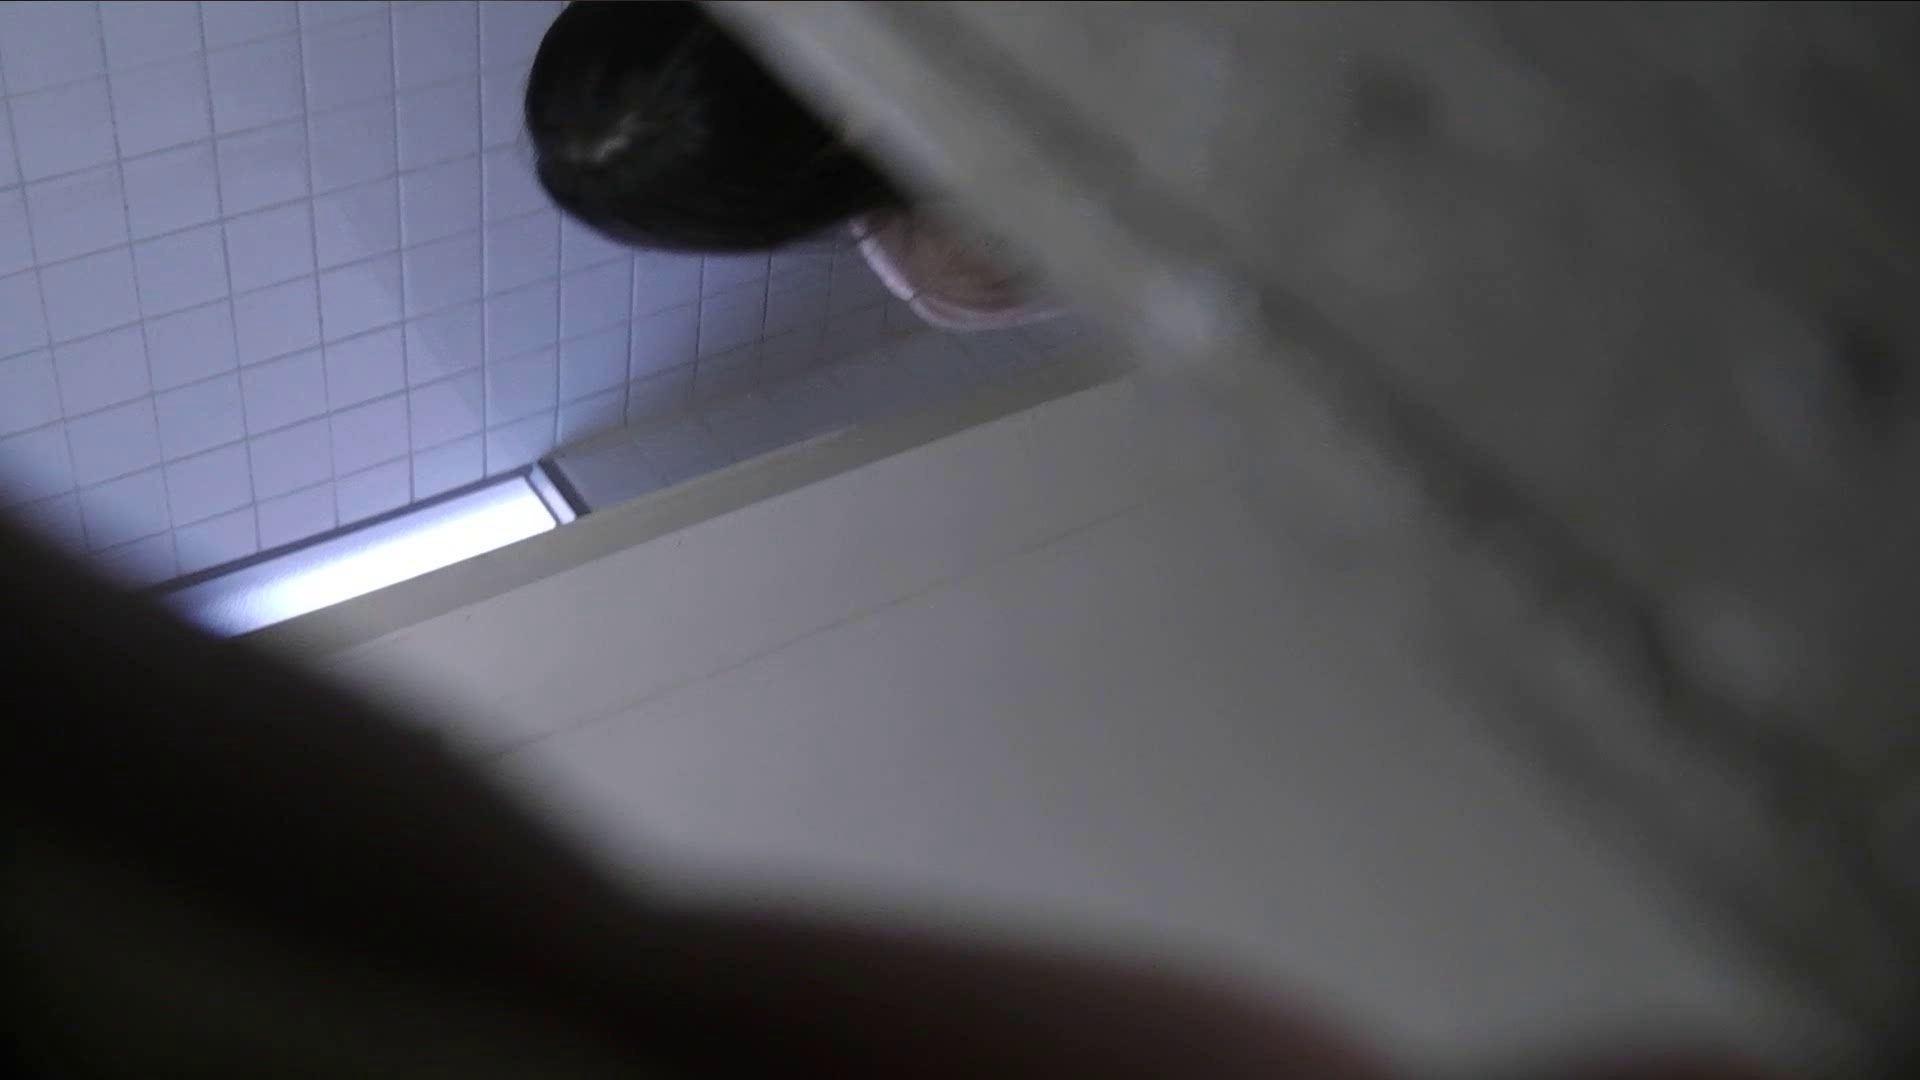 vol.06 命がけ潜伏洗面所! 茶髪タン、ハァハァ 前編 OLのエロ生活 盗み撮り動画キャプチャ 107連発 30